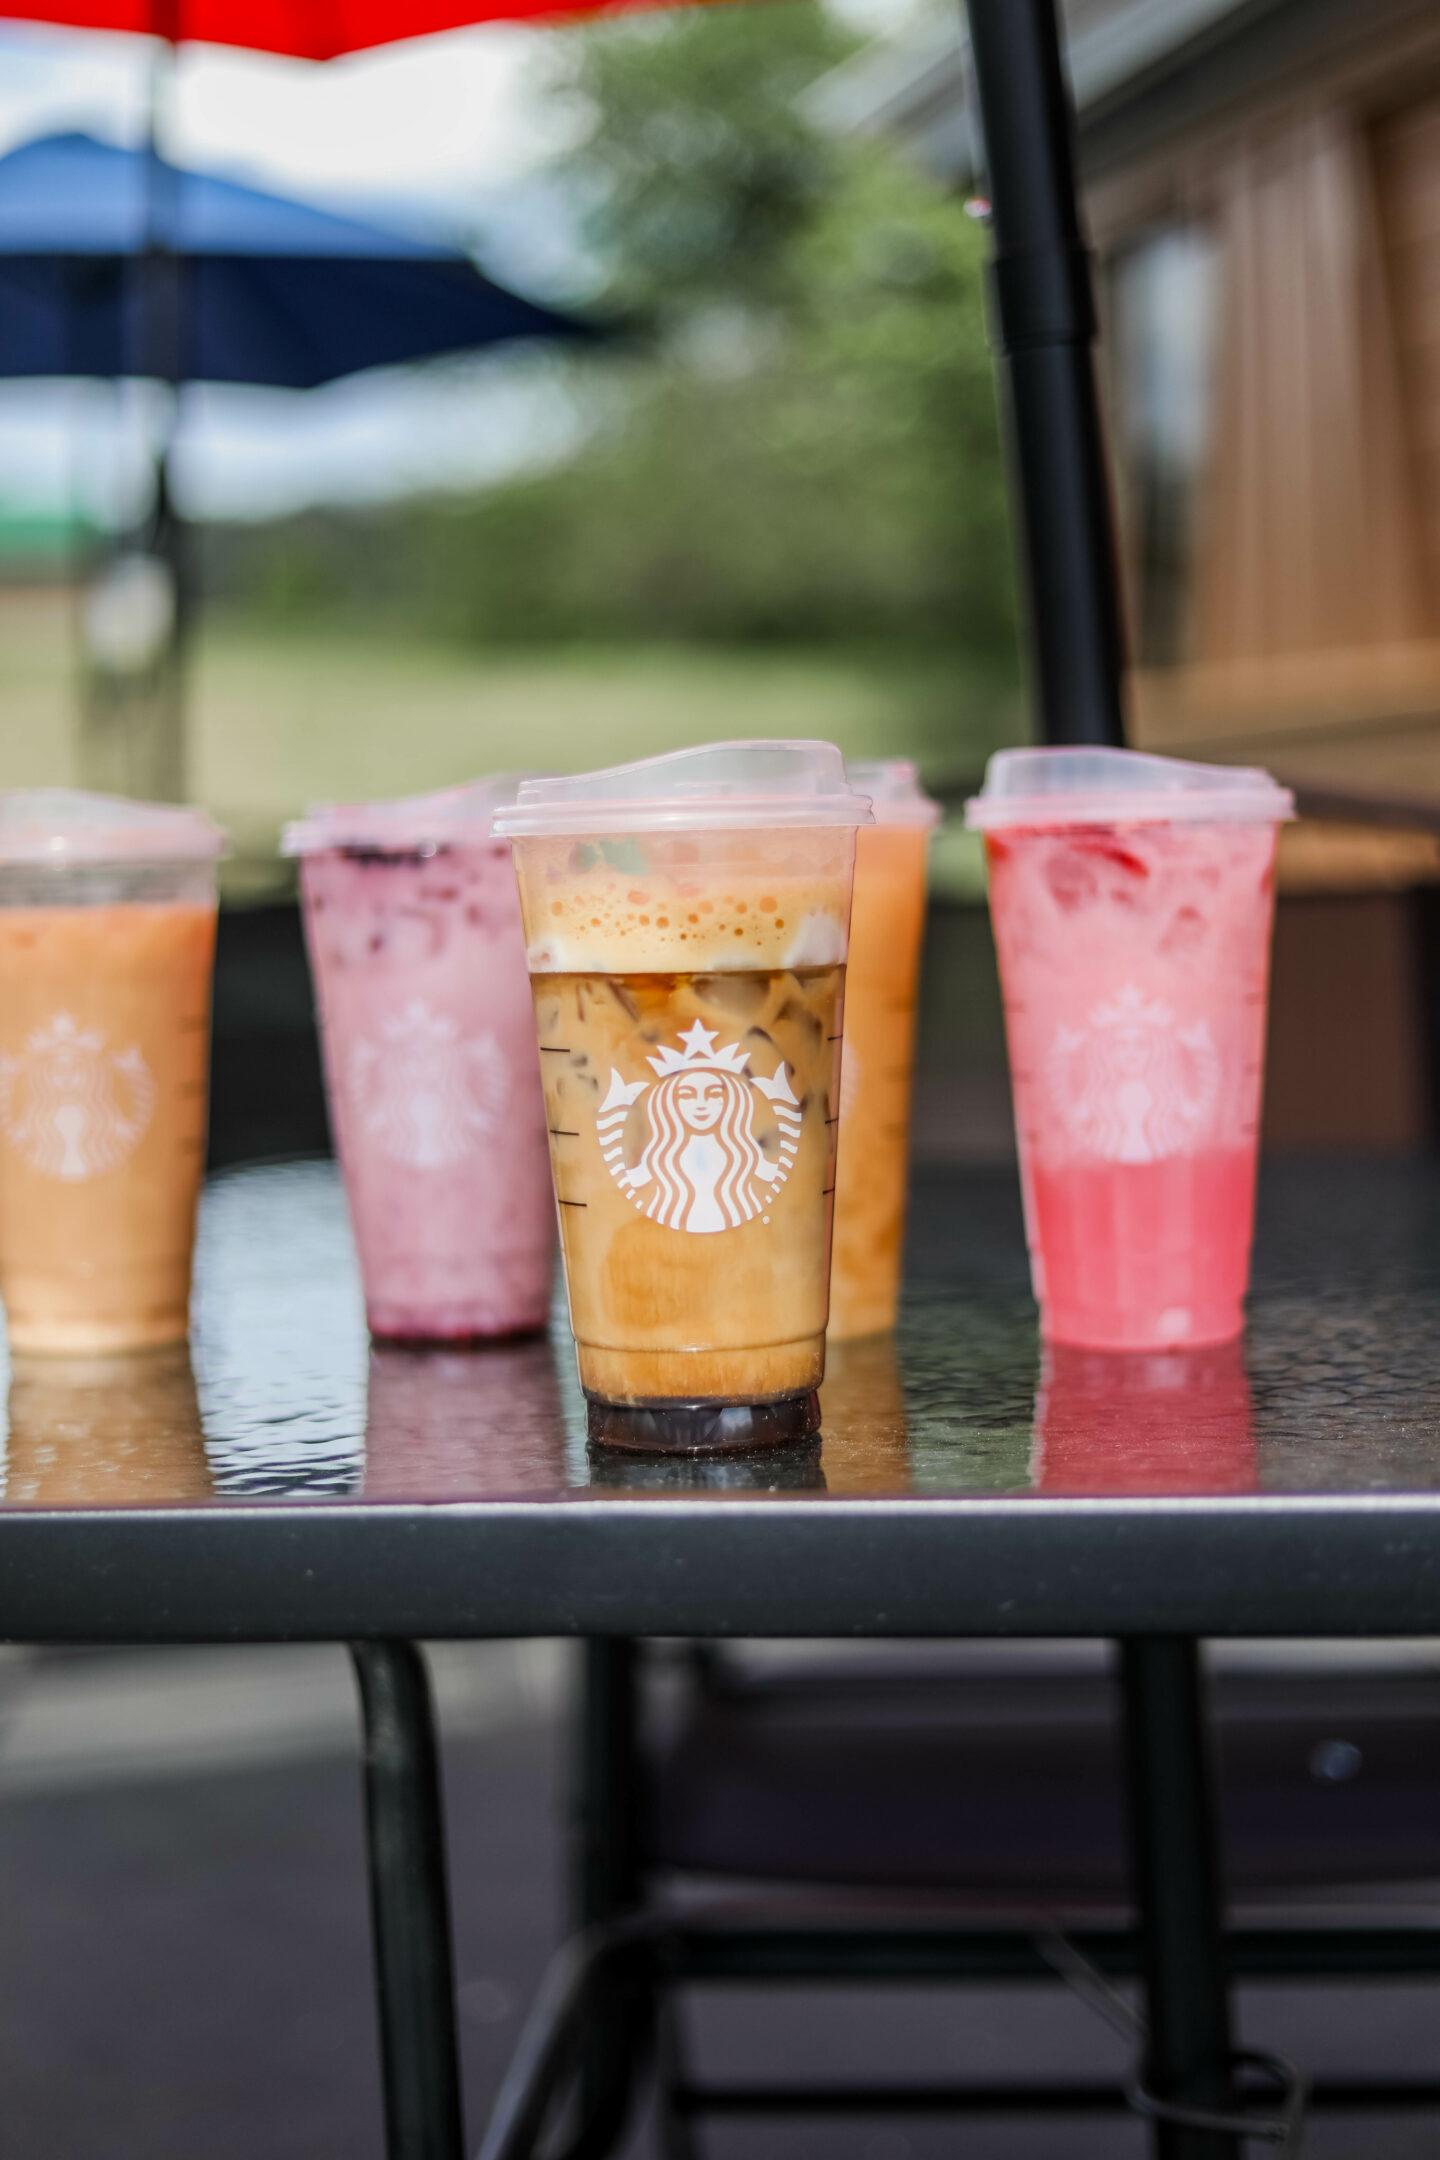 5 Refreshing Starbucks Drinks (+ How to order them!) - BROWN SUGAR OATMILK ESPRESSO